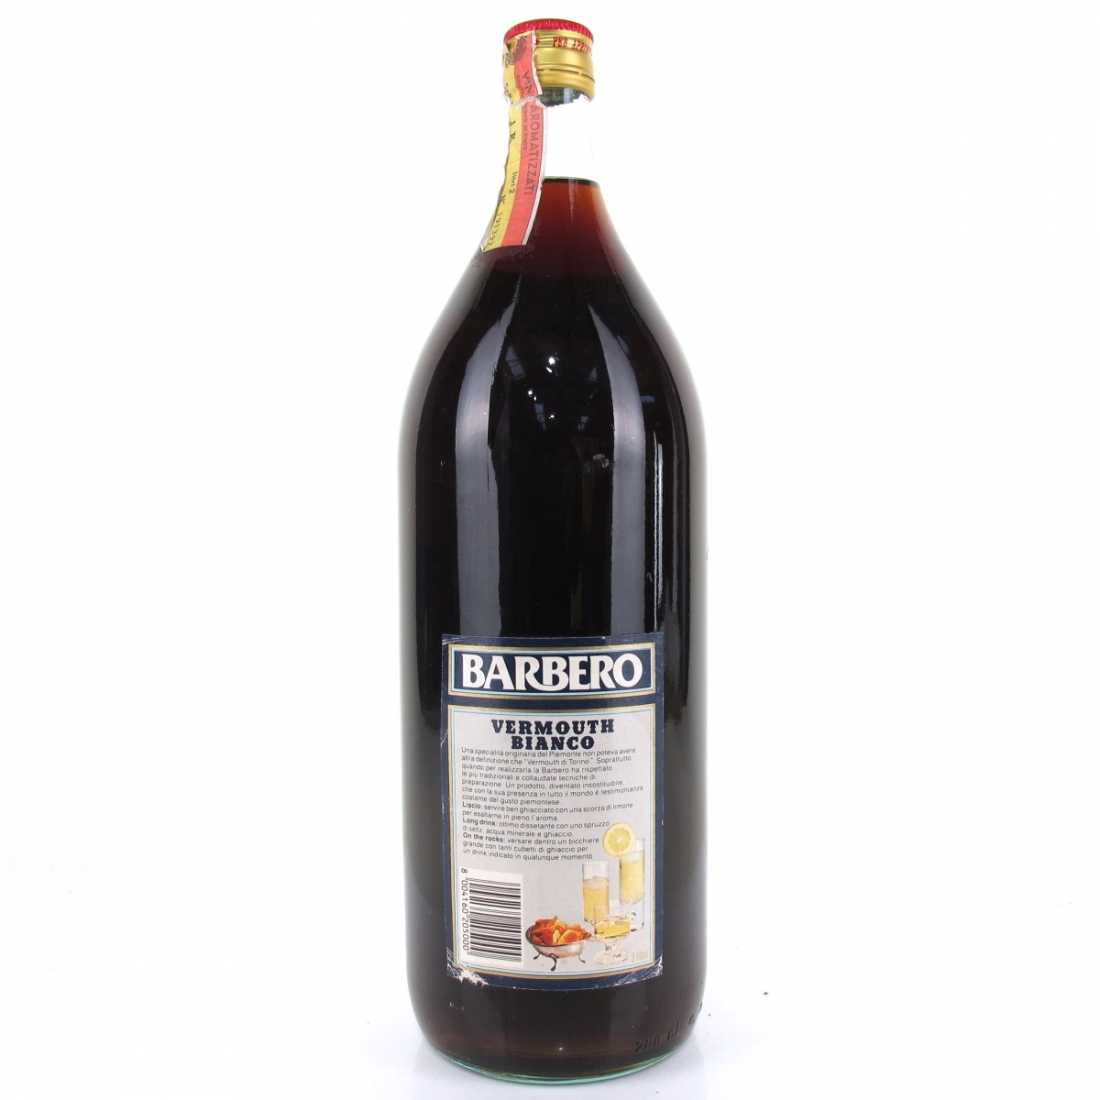 Barbero Vermouth Bianco 2 Litre